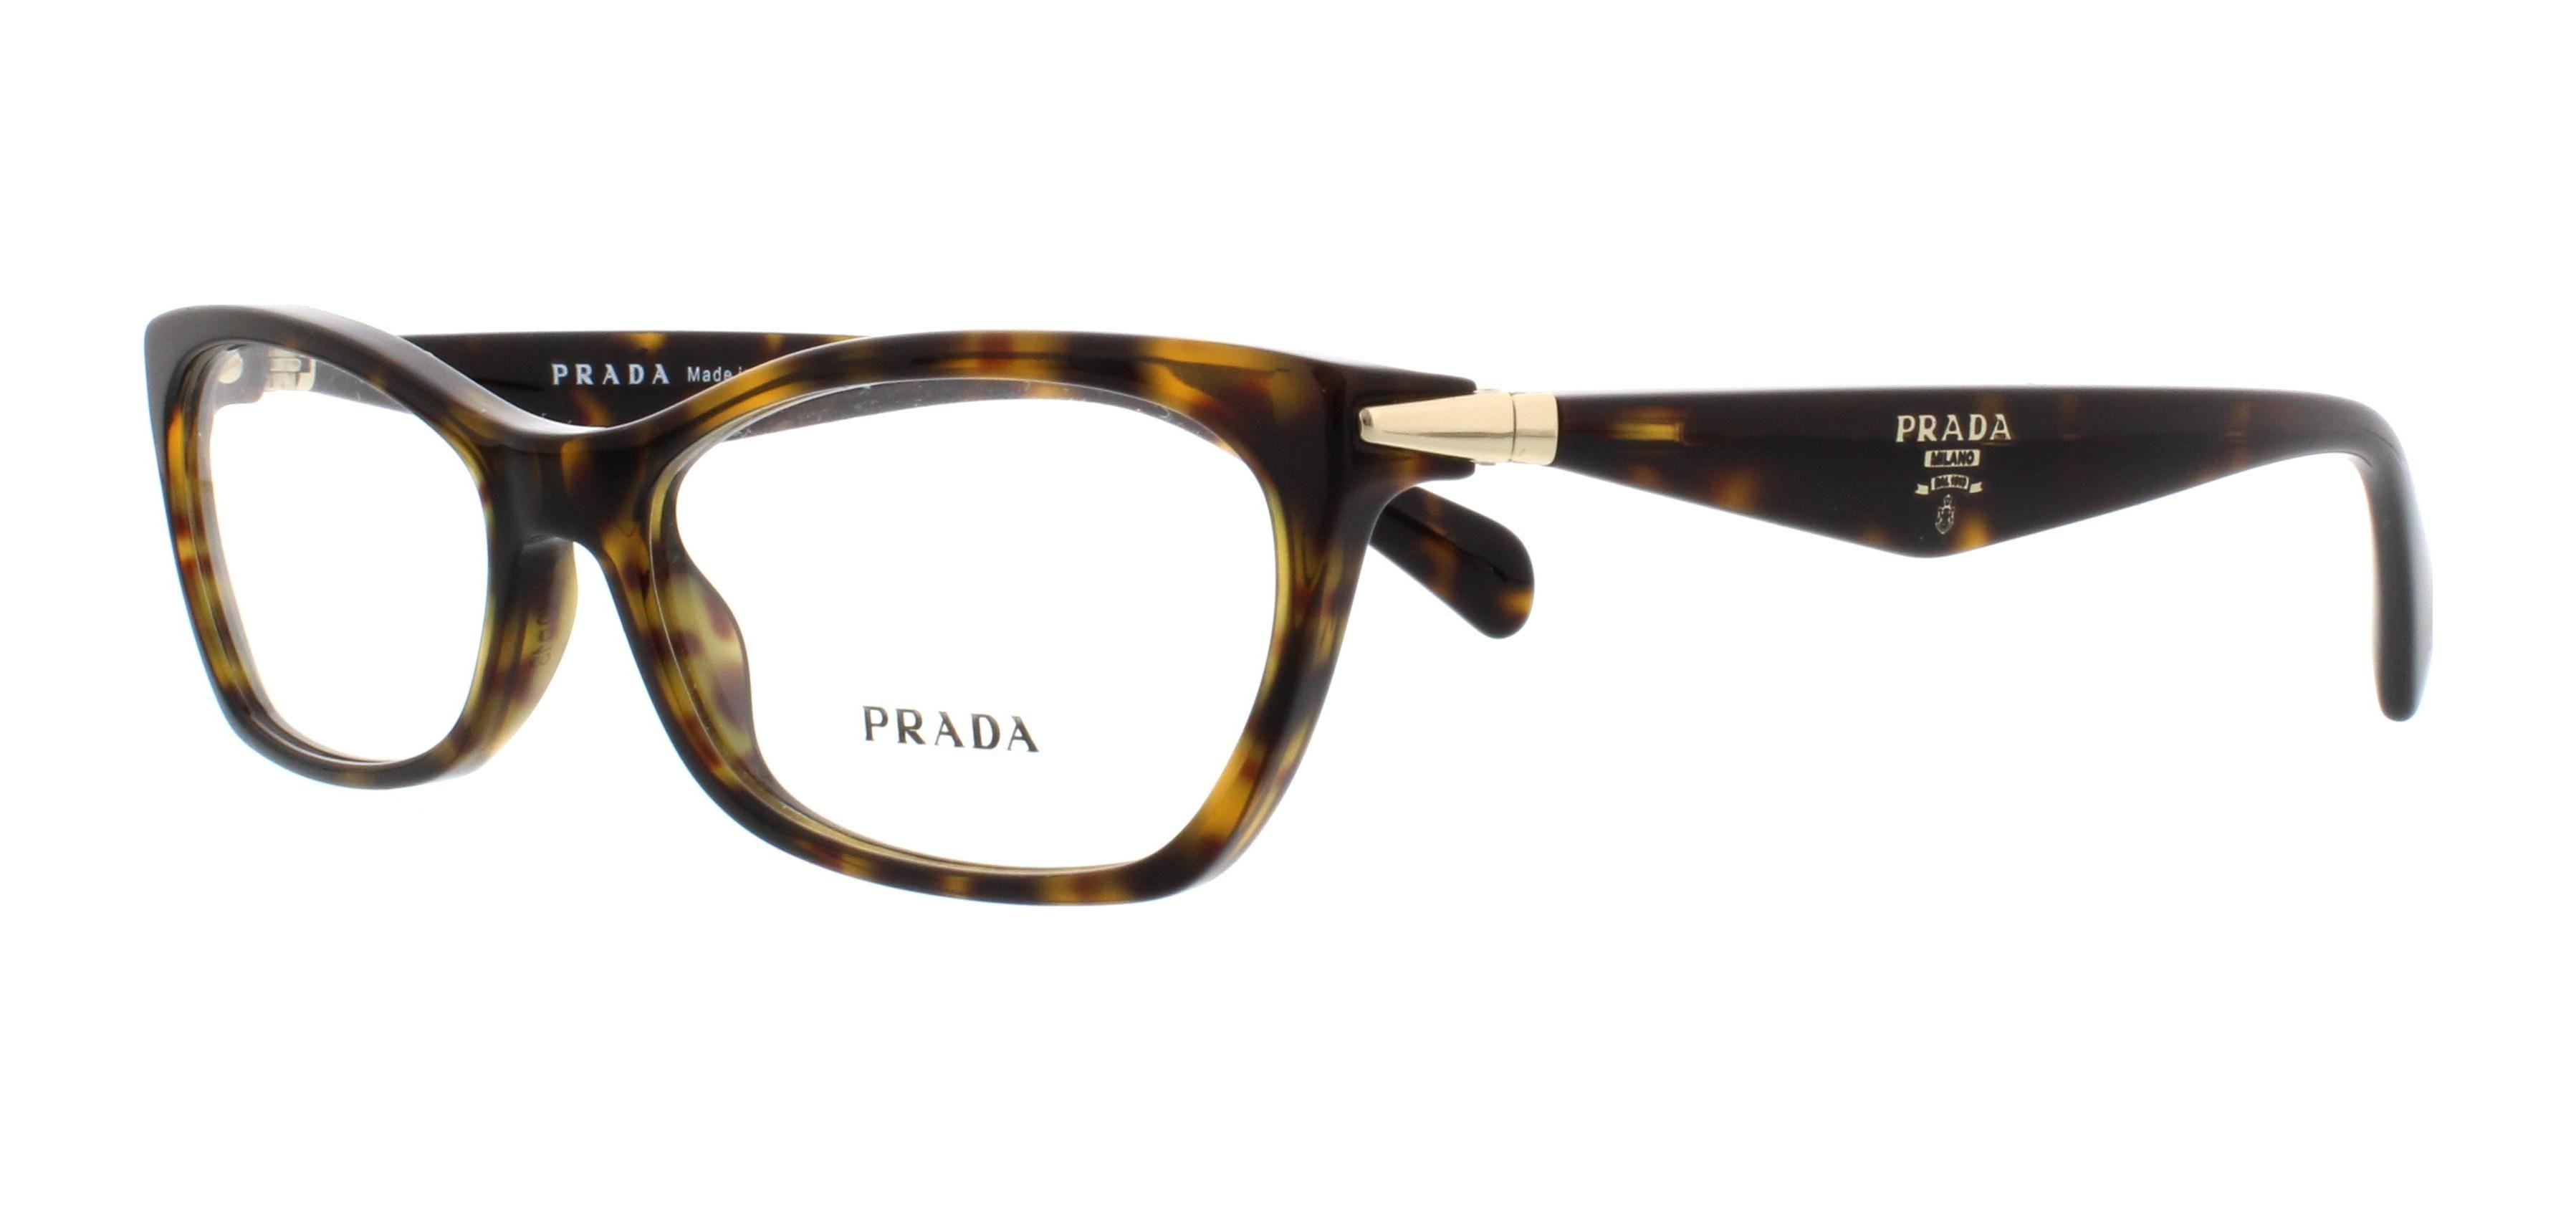 63f9f65d67 Pin by Carolyn Ferguson on Glasses